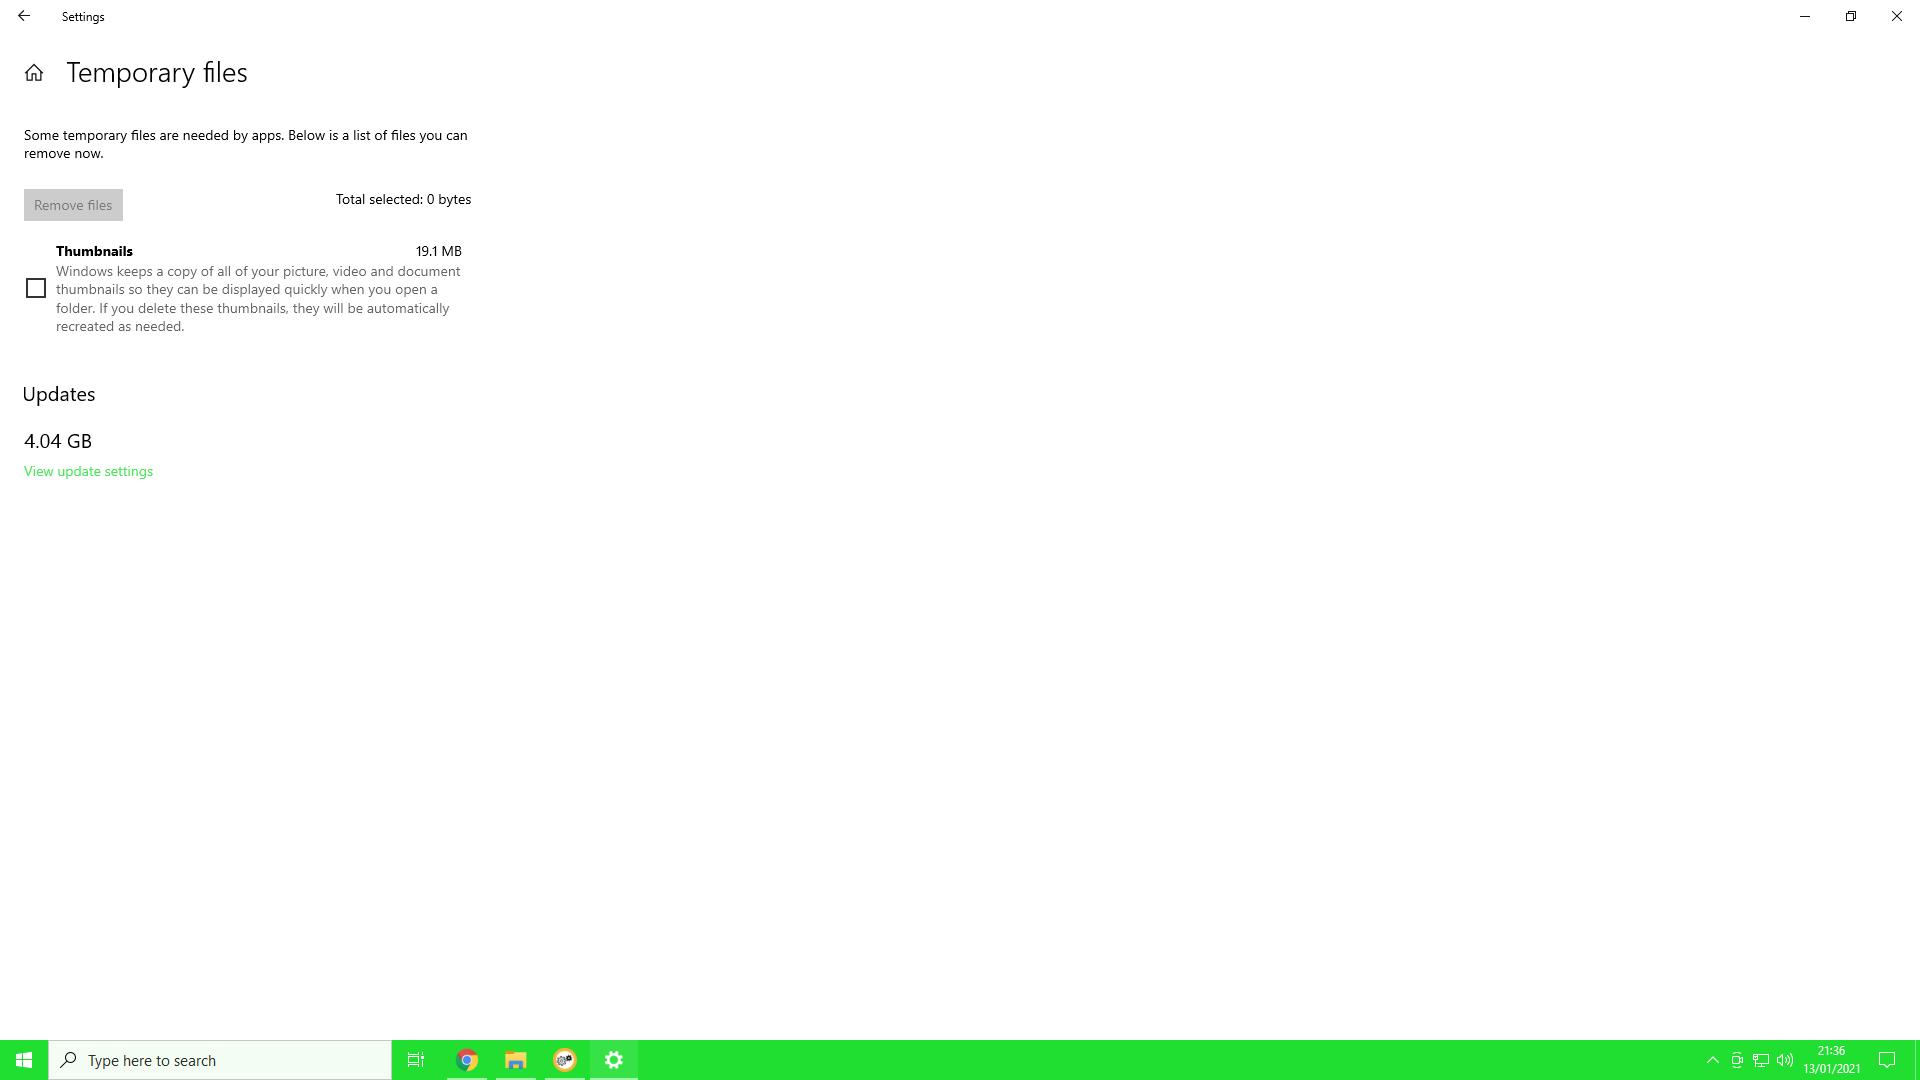 Updates 4.04 GB but SoftwareDistribution folder is empty. 3c633684-8601-4375-aa2a-6bff745f2707?upload=true.png